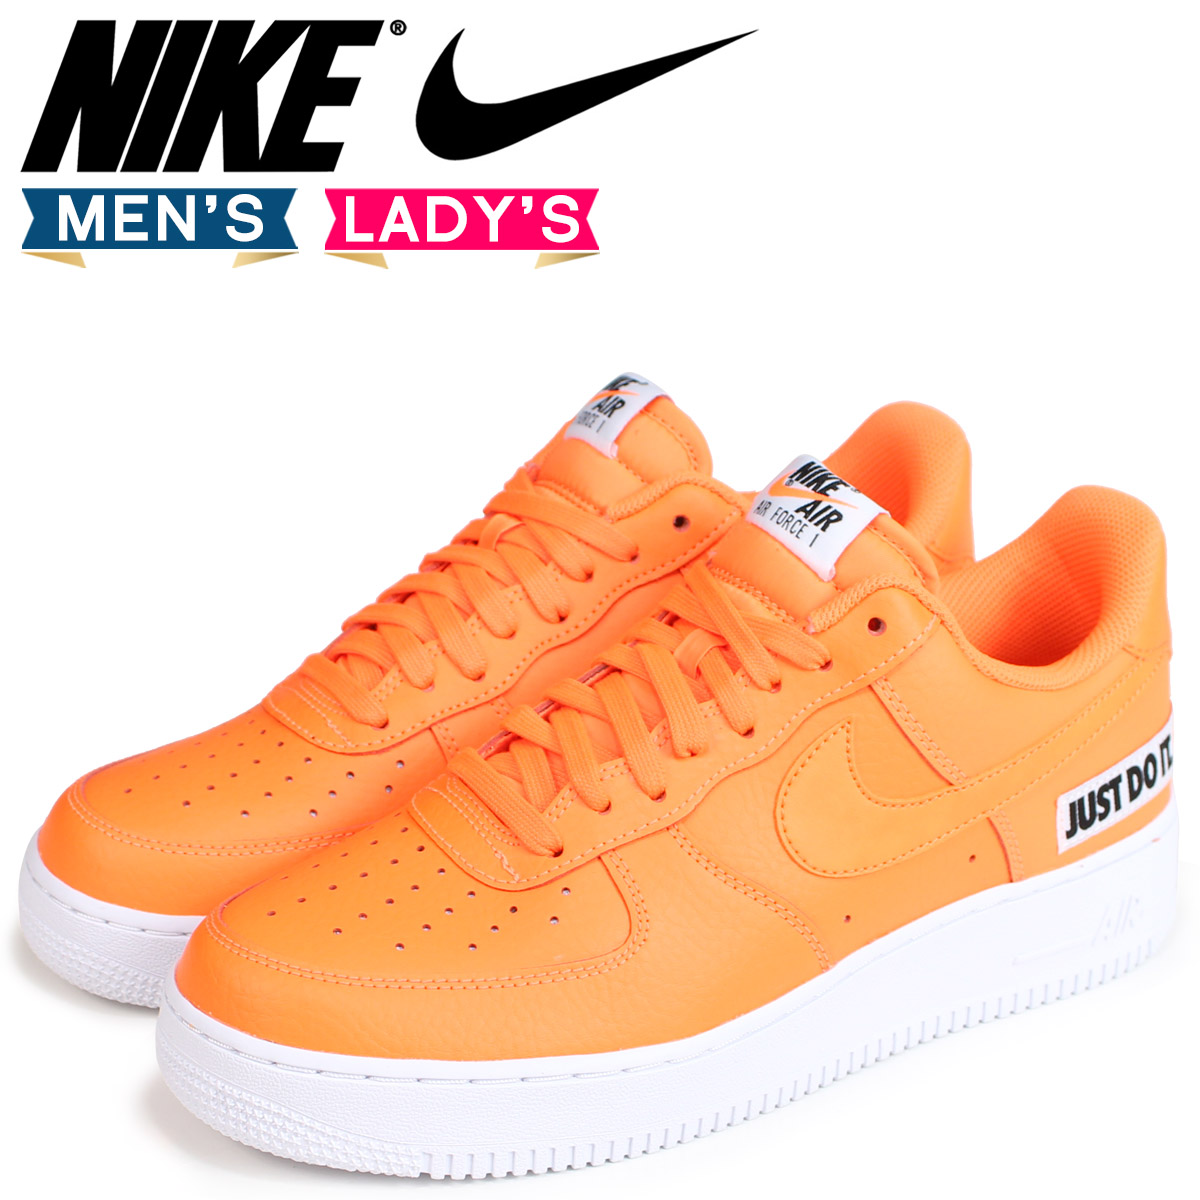 Nike Leather Force Sneakers Orange Do Just It Gap Lv8 Bq5360 1 Dis Men Air 800 07 UVpqzSMG